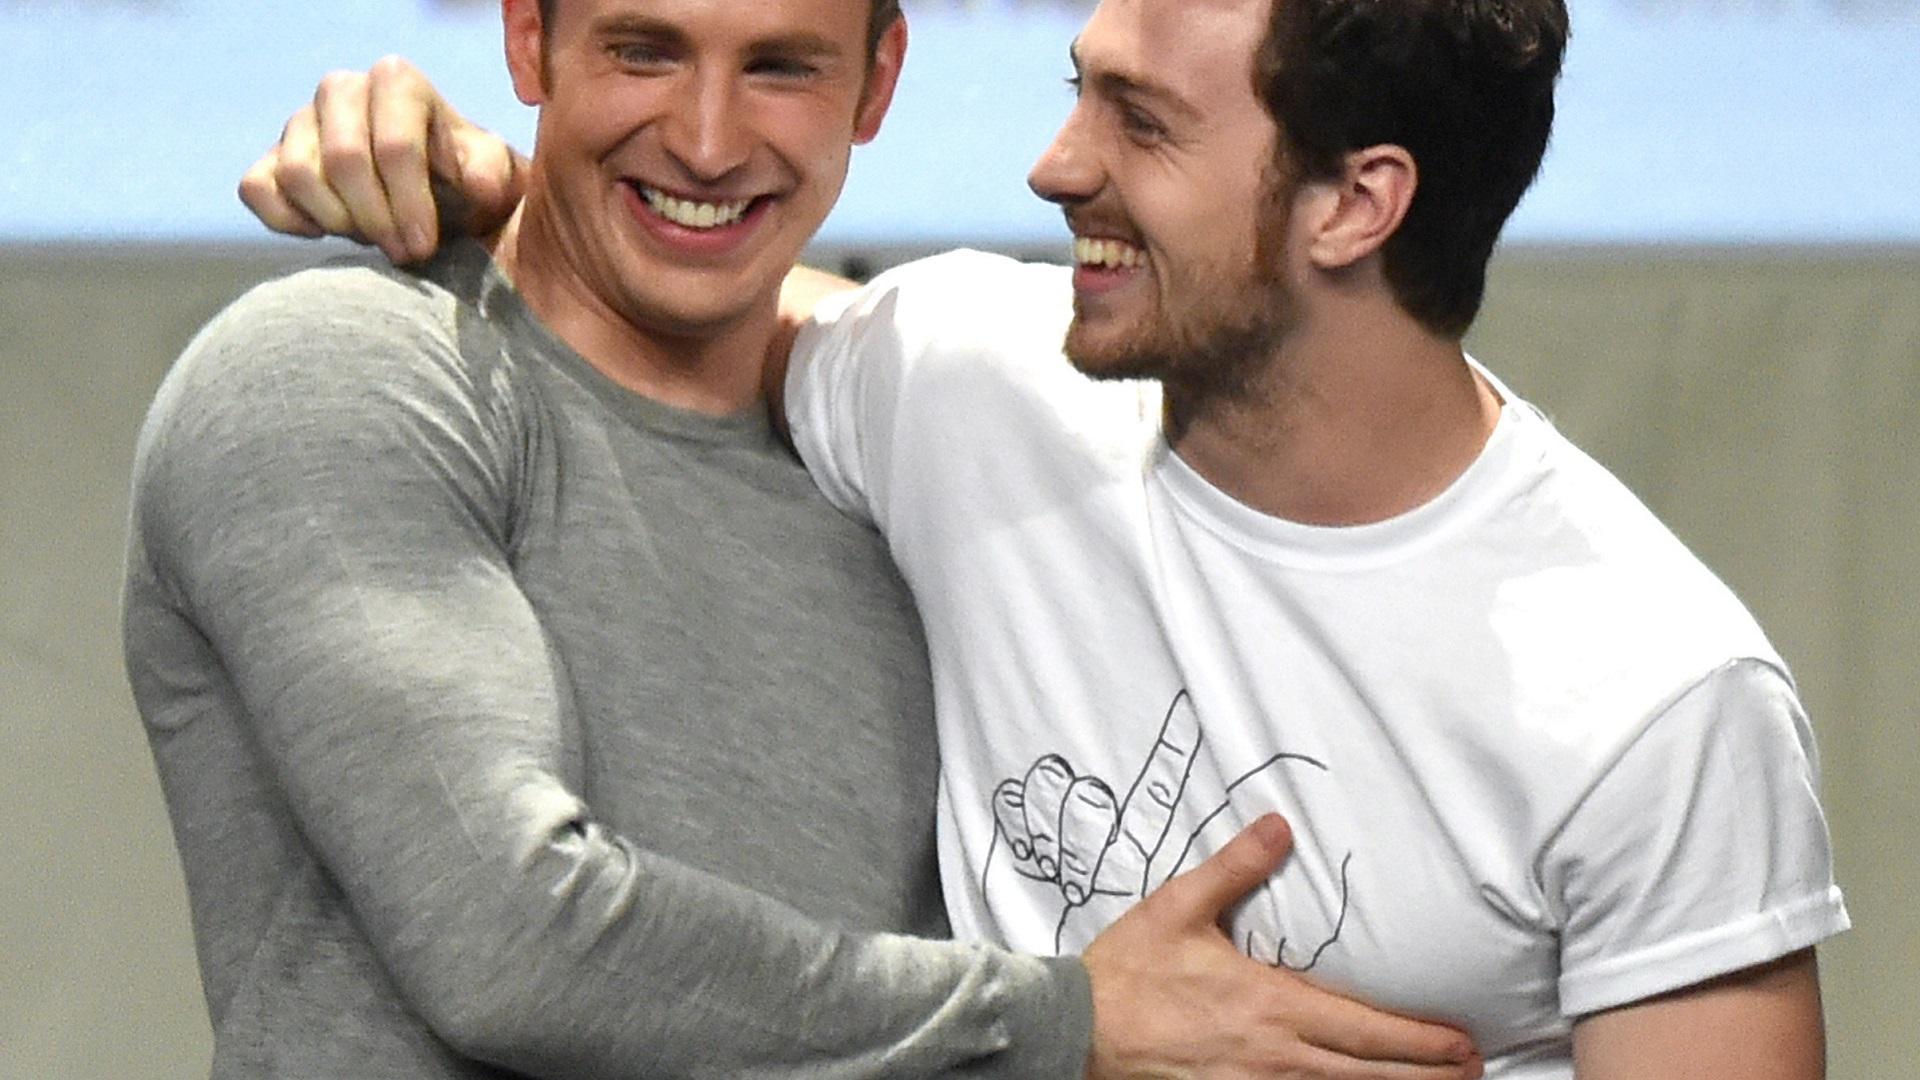 Chris Evans 'Gay Kardeşim Bana İlham Veriyor..'